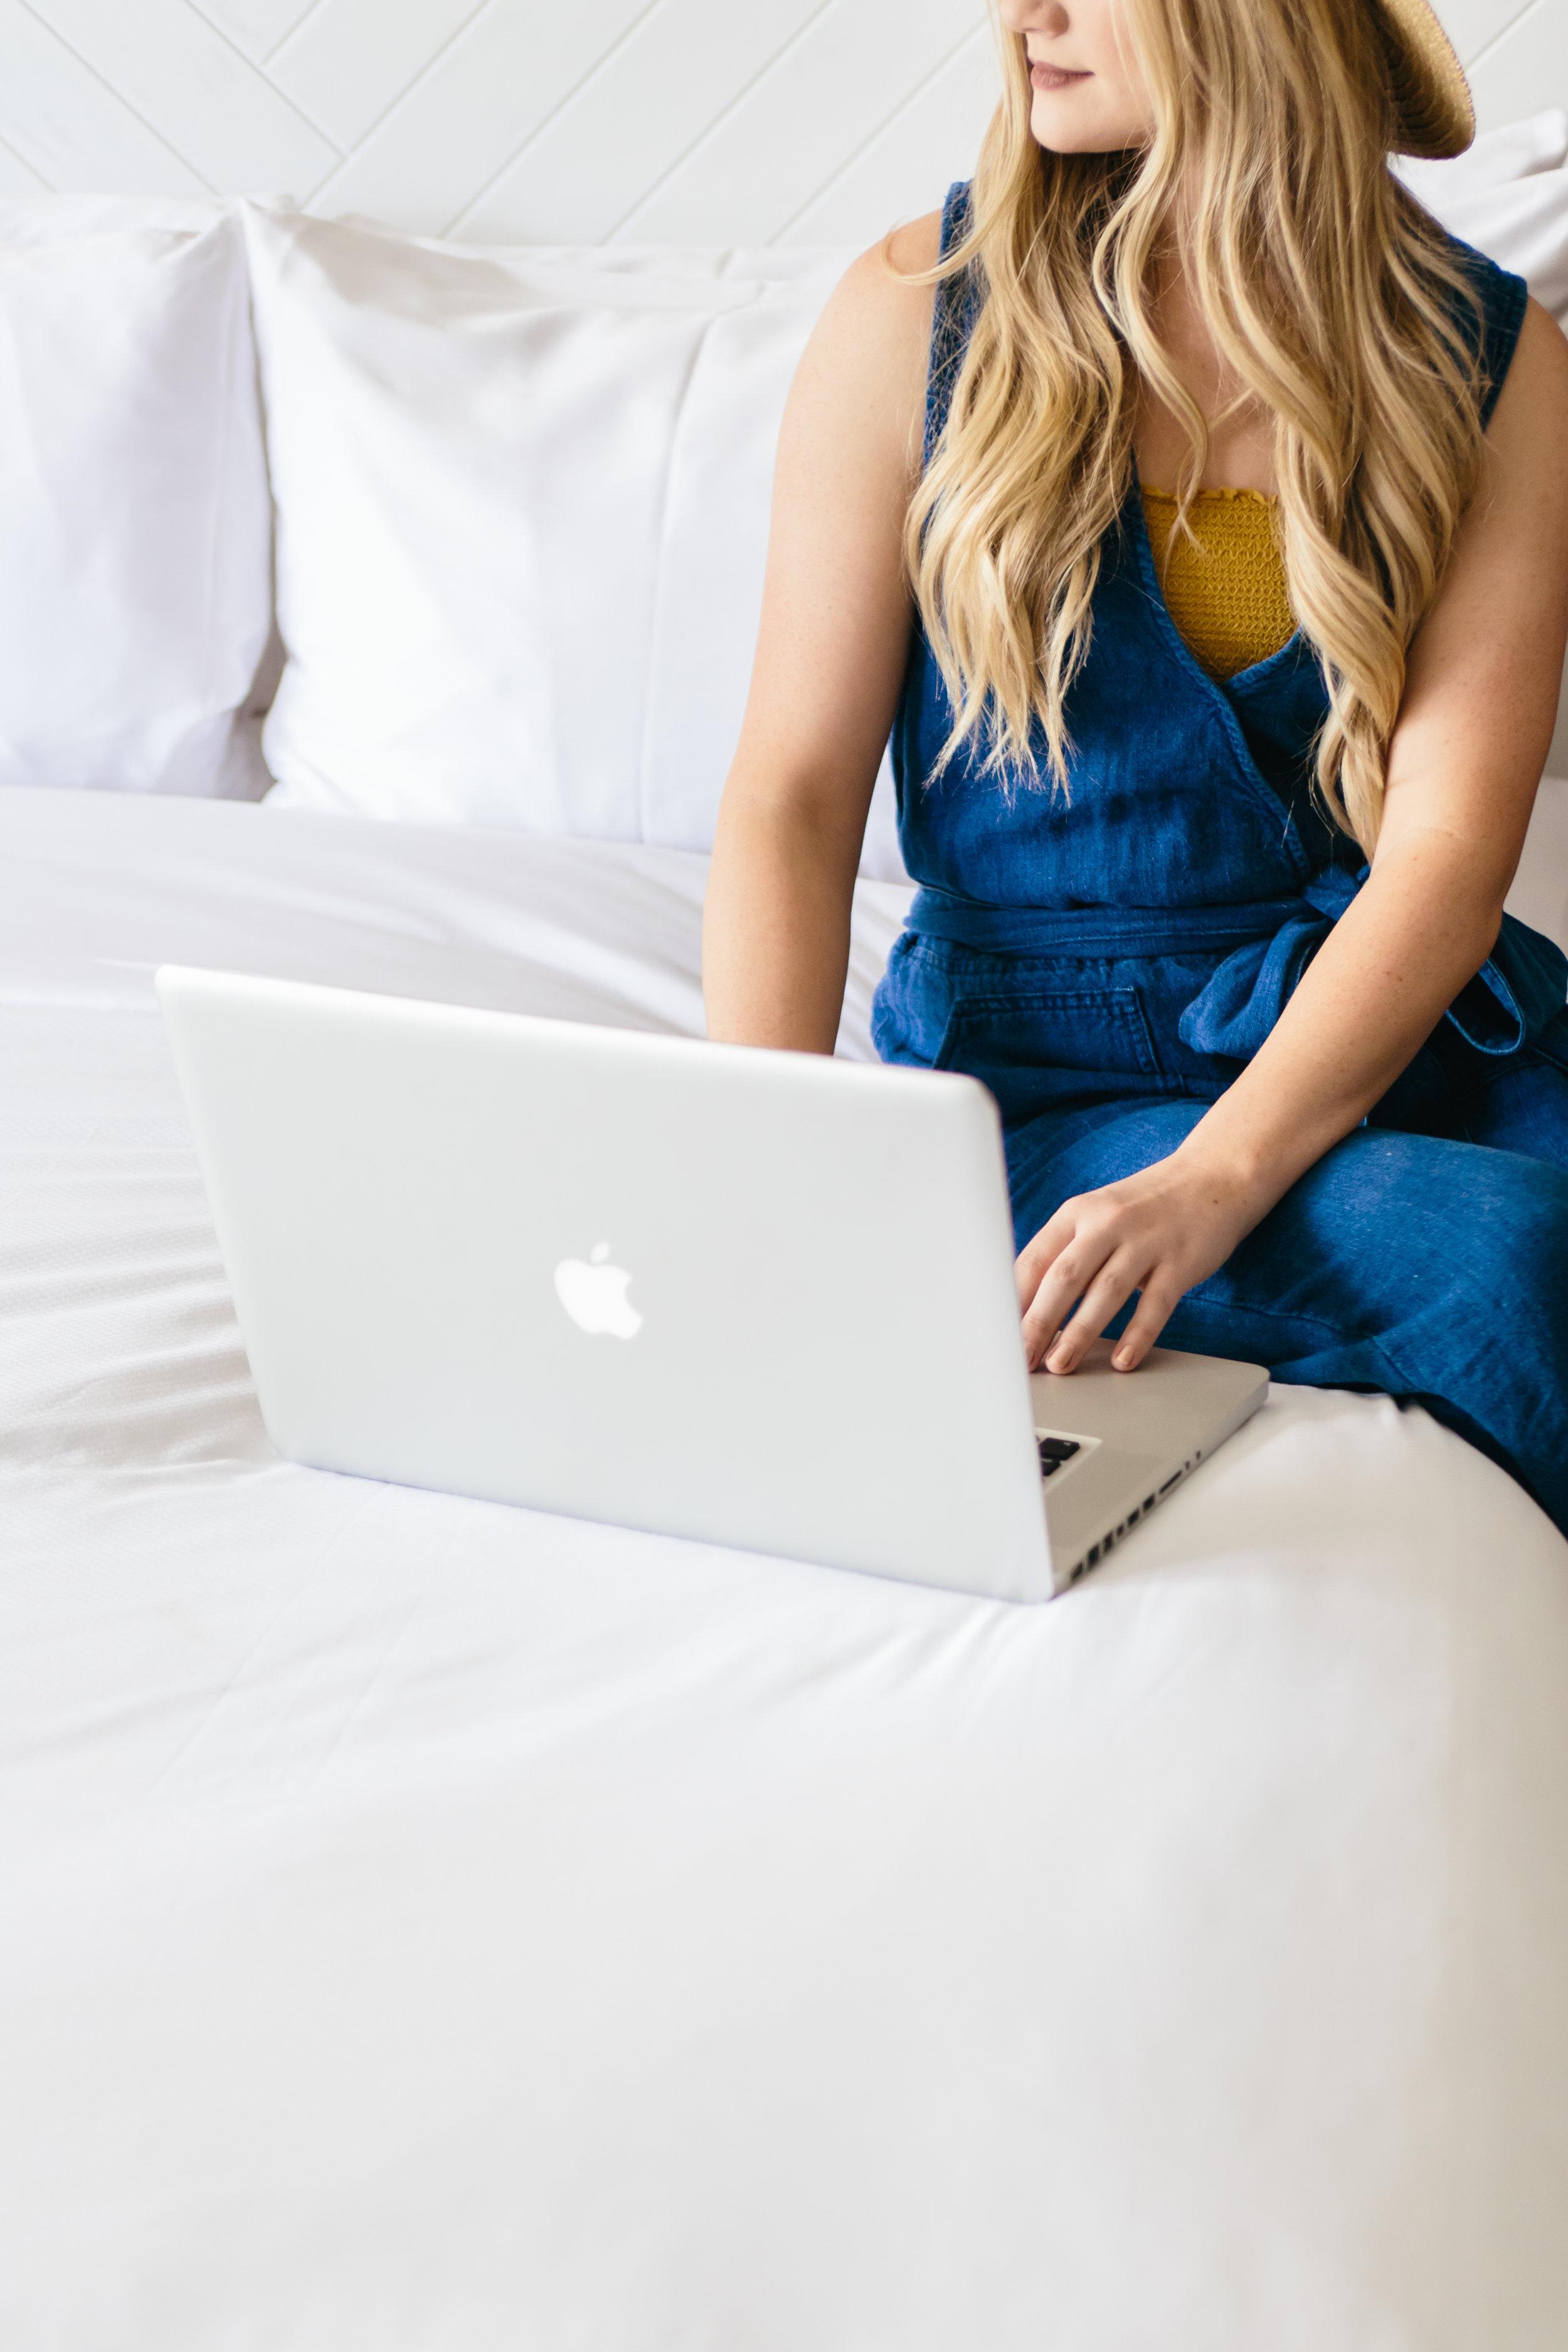 bloguettes-stockthatrocks-staycation-2018-18.jpg